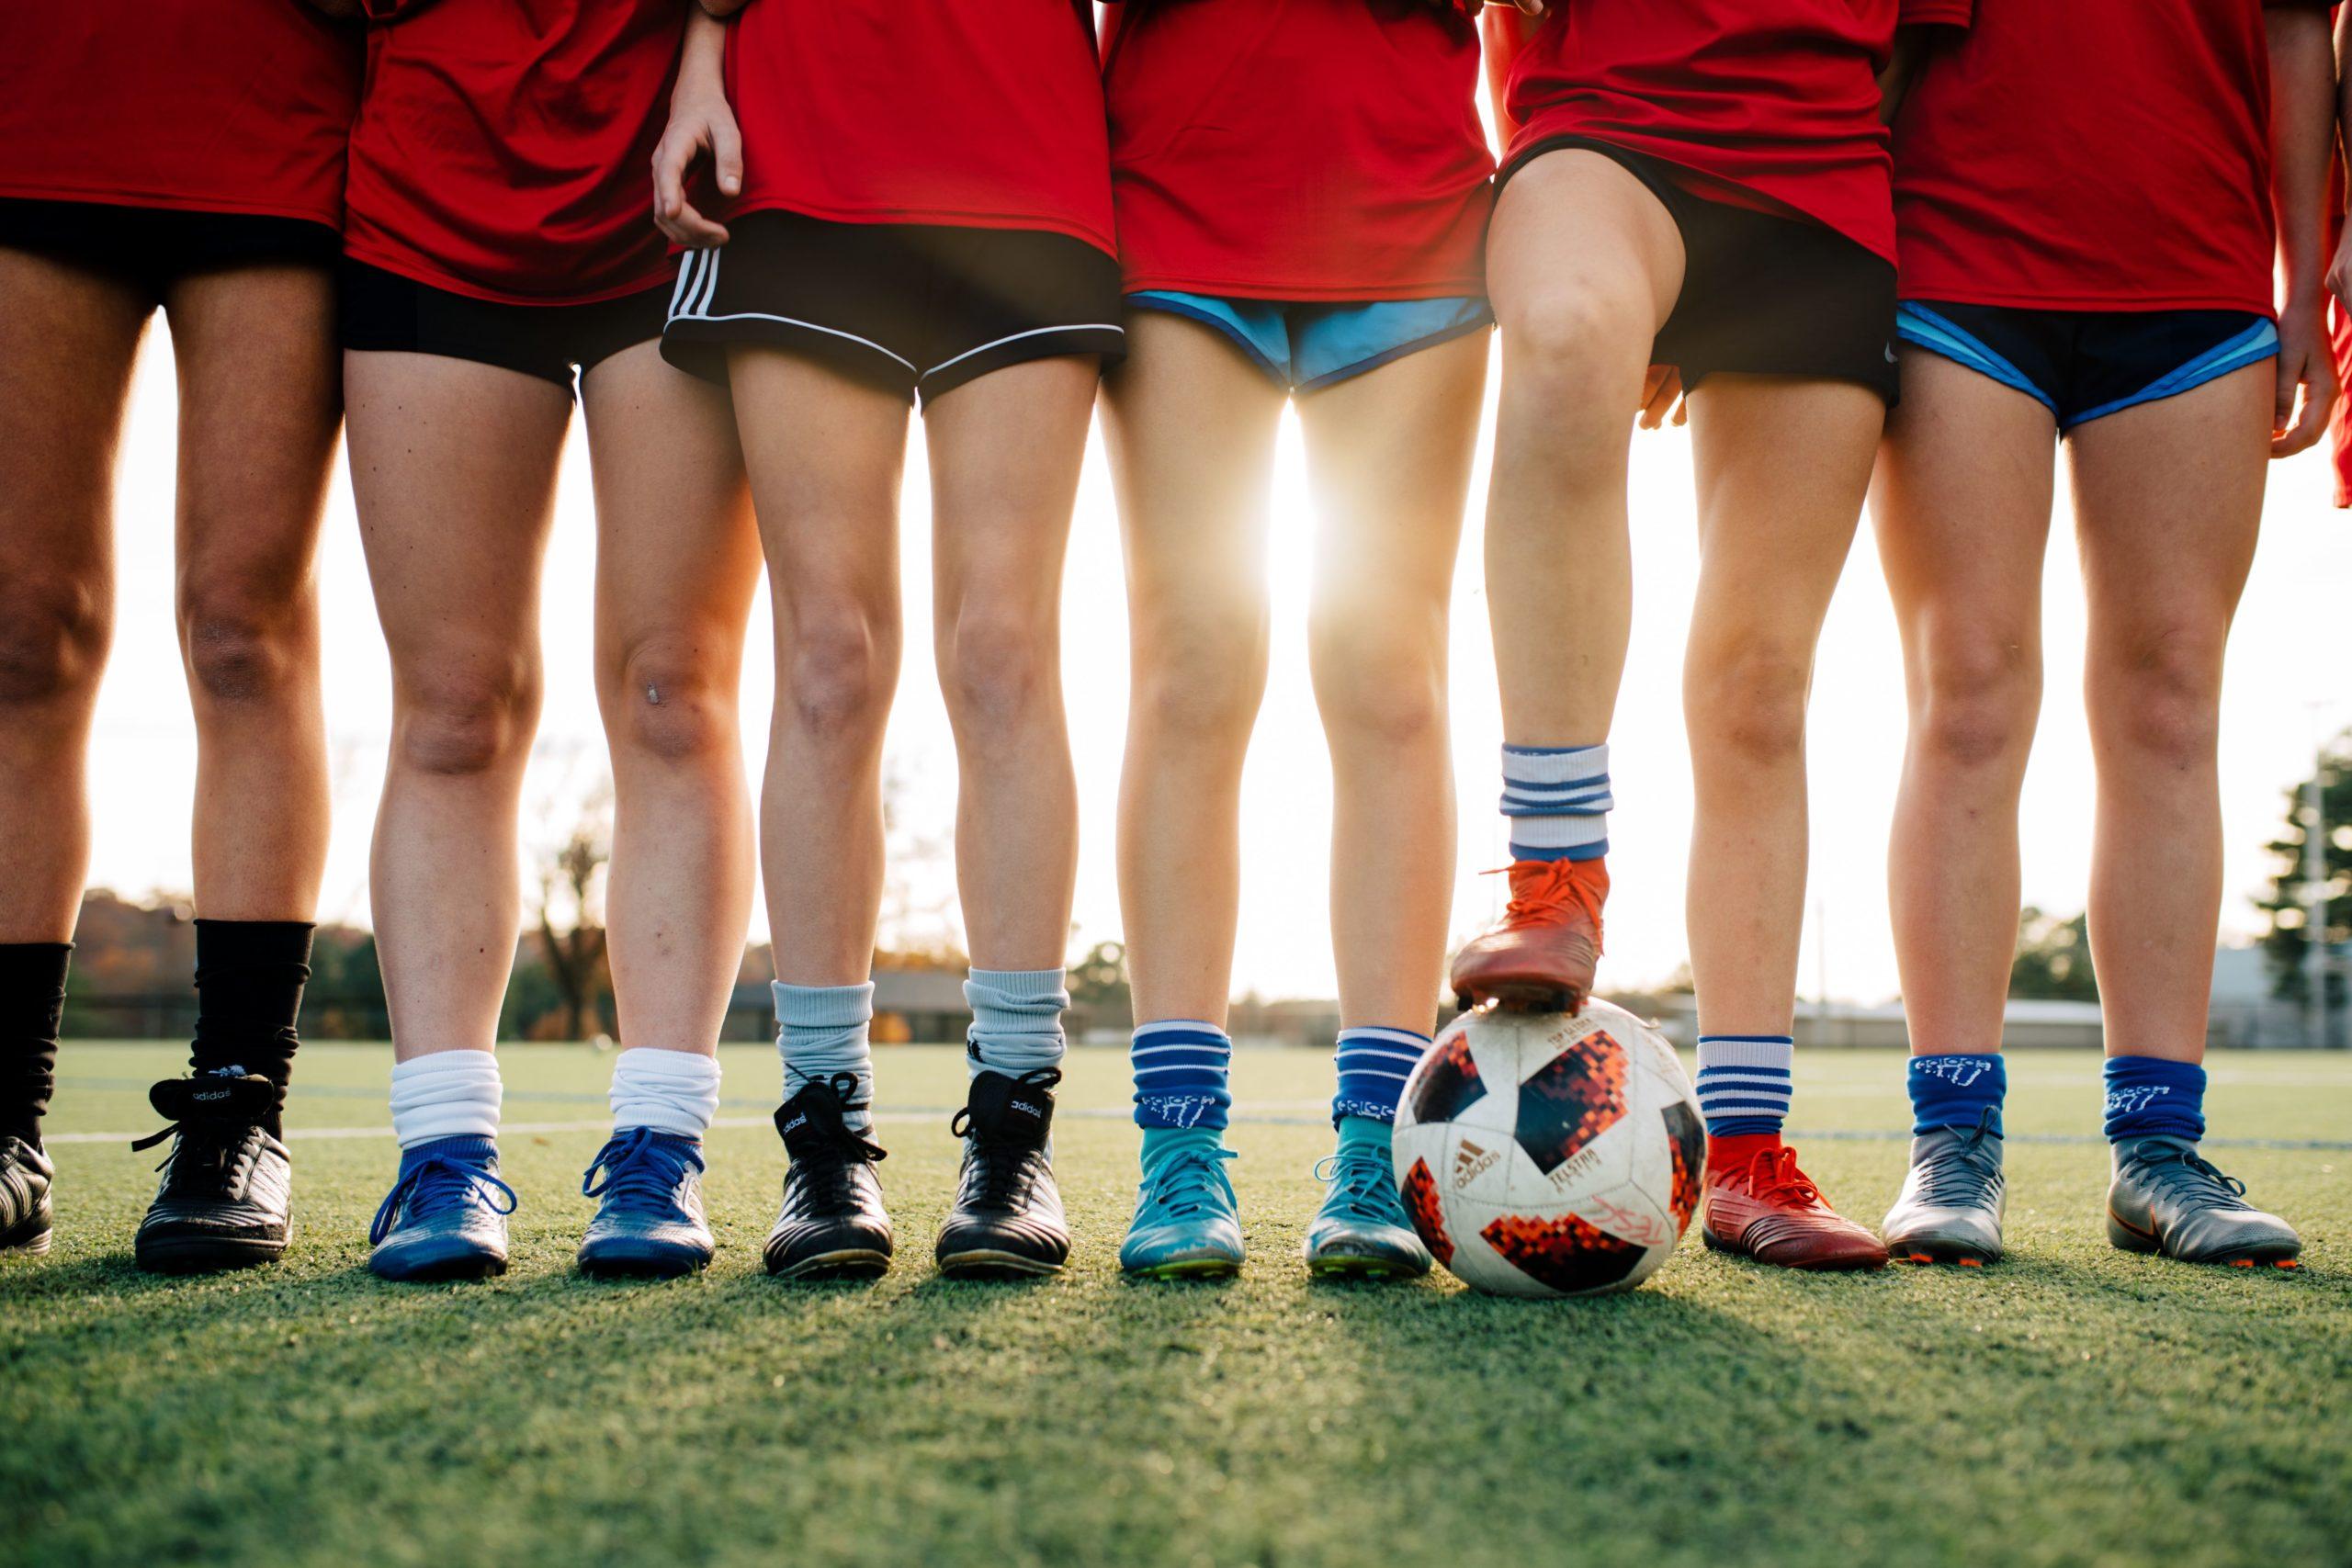 soccer players' legs